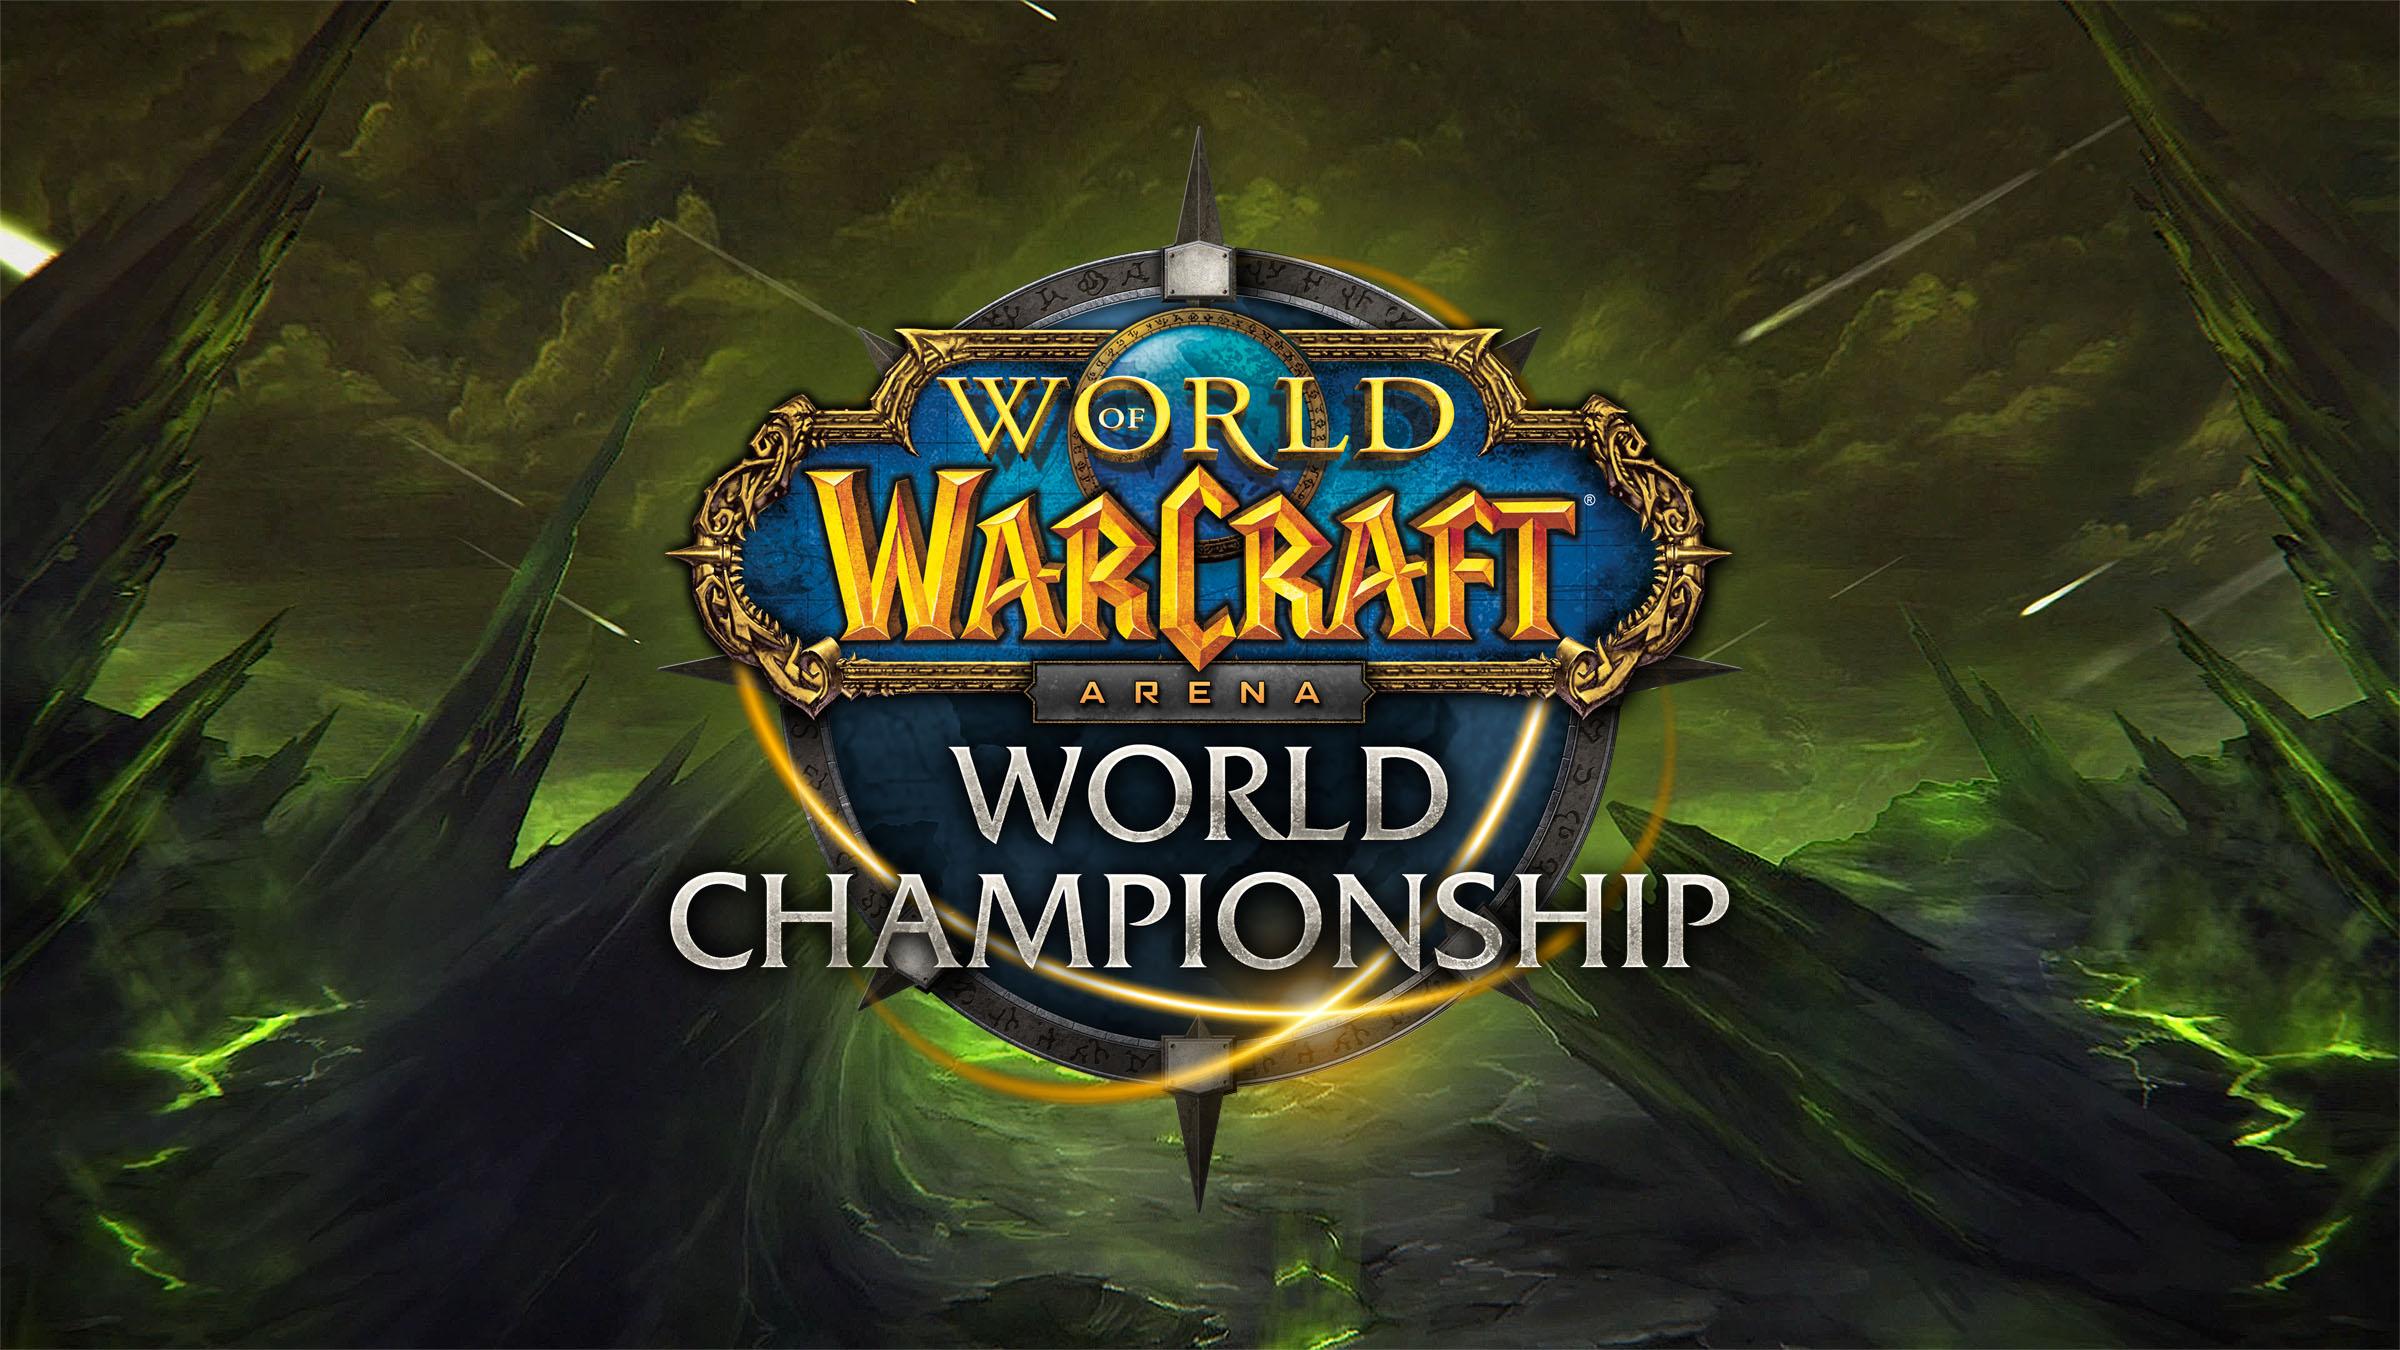 La final de World of Warcraft Arena World Championship se celebra este fin de semana en Polonia